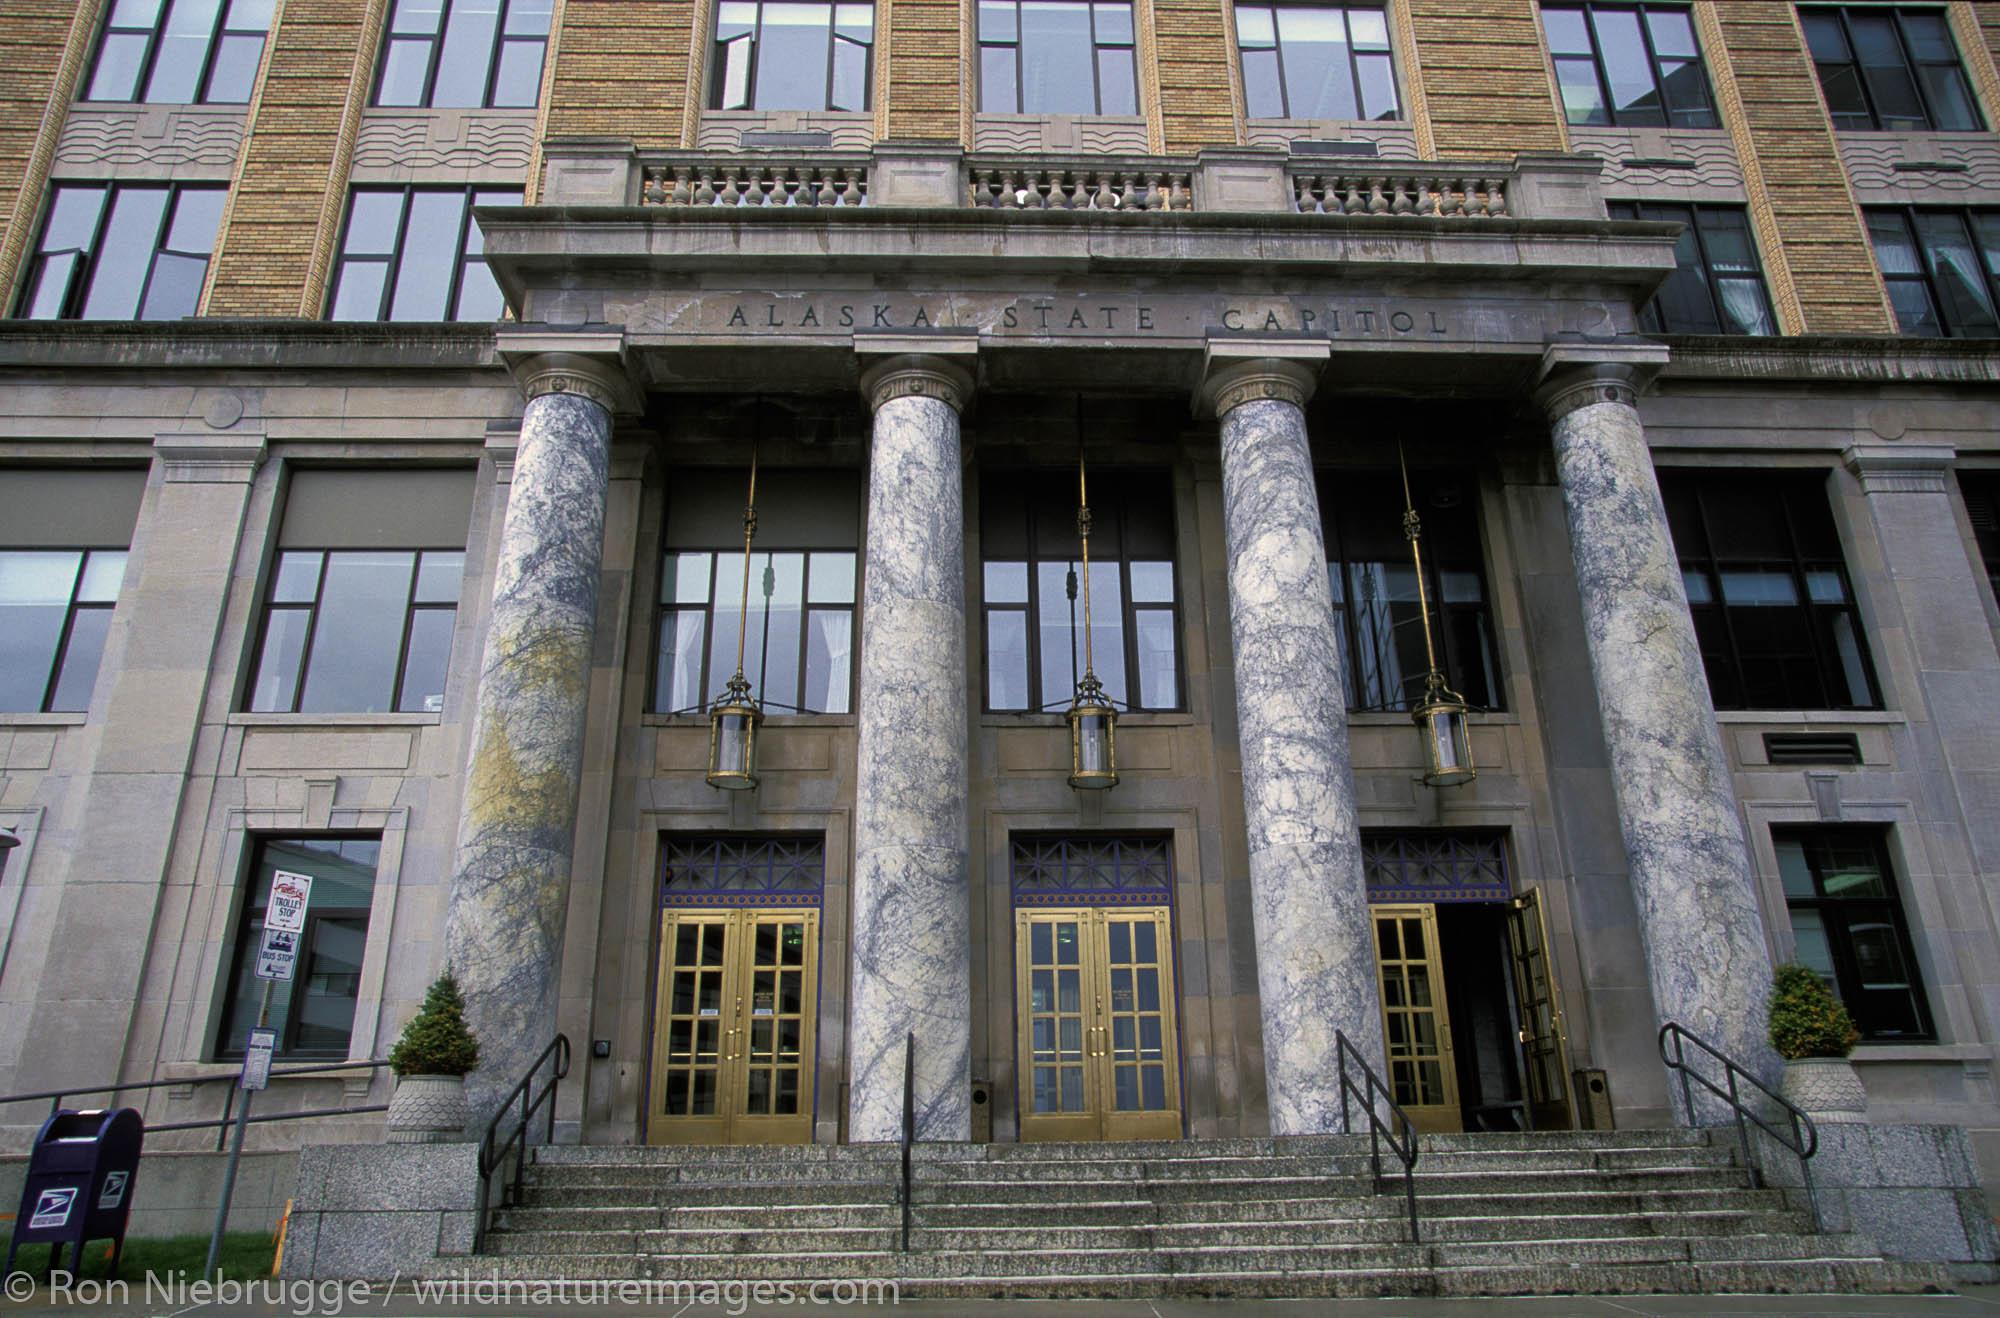 Alaska State Capital building, Juneau, Alaska.